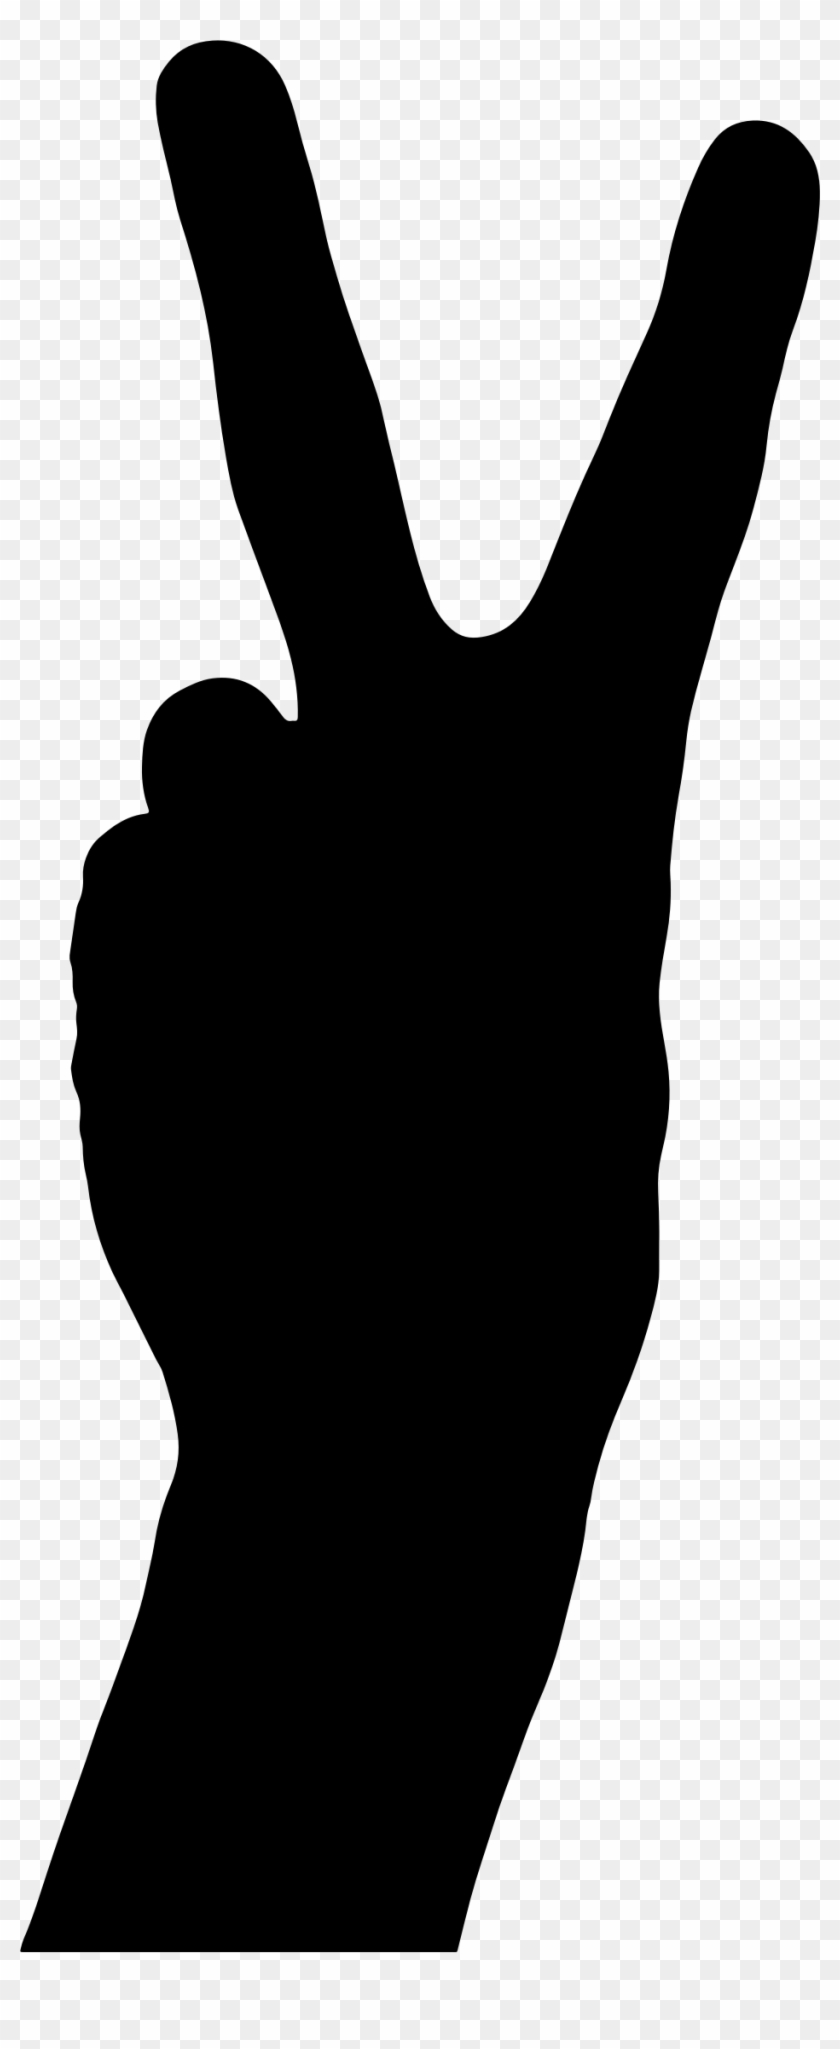 Clipart - 2 Hand Signal Vector #119689